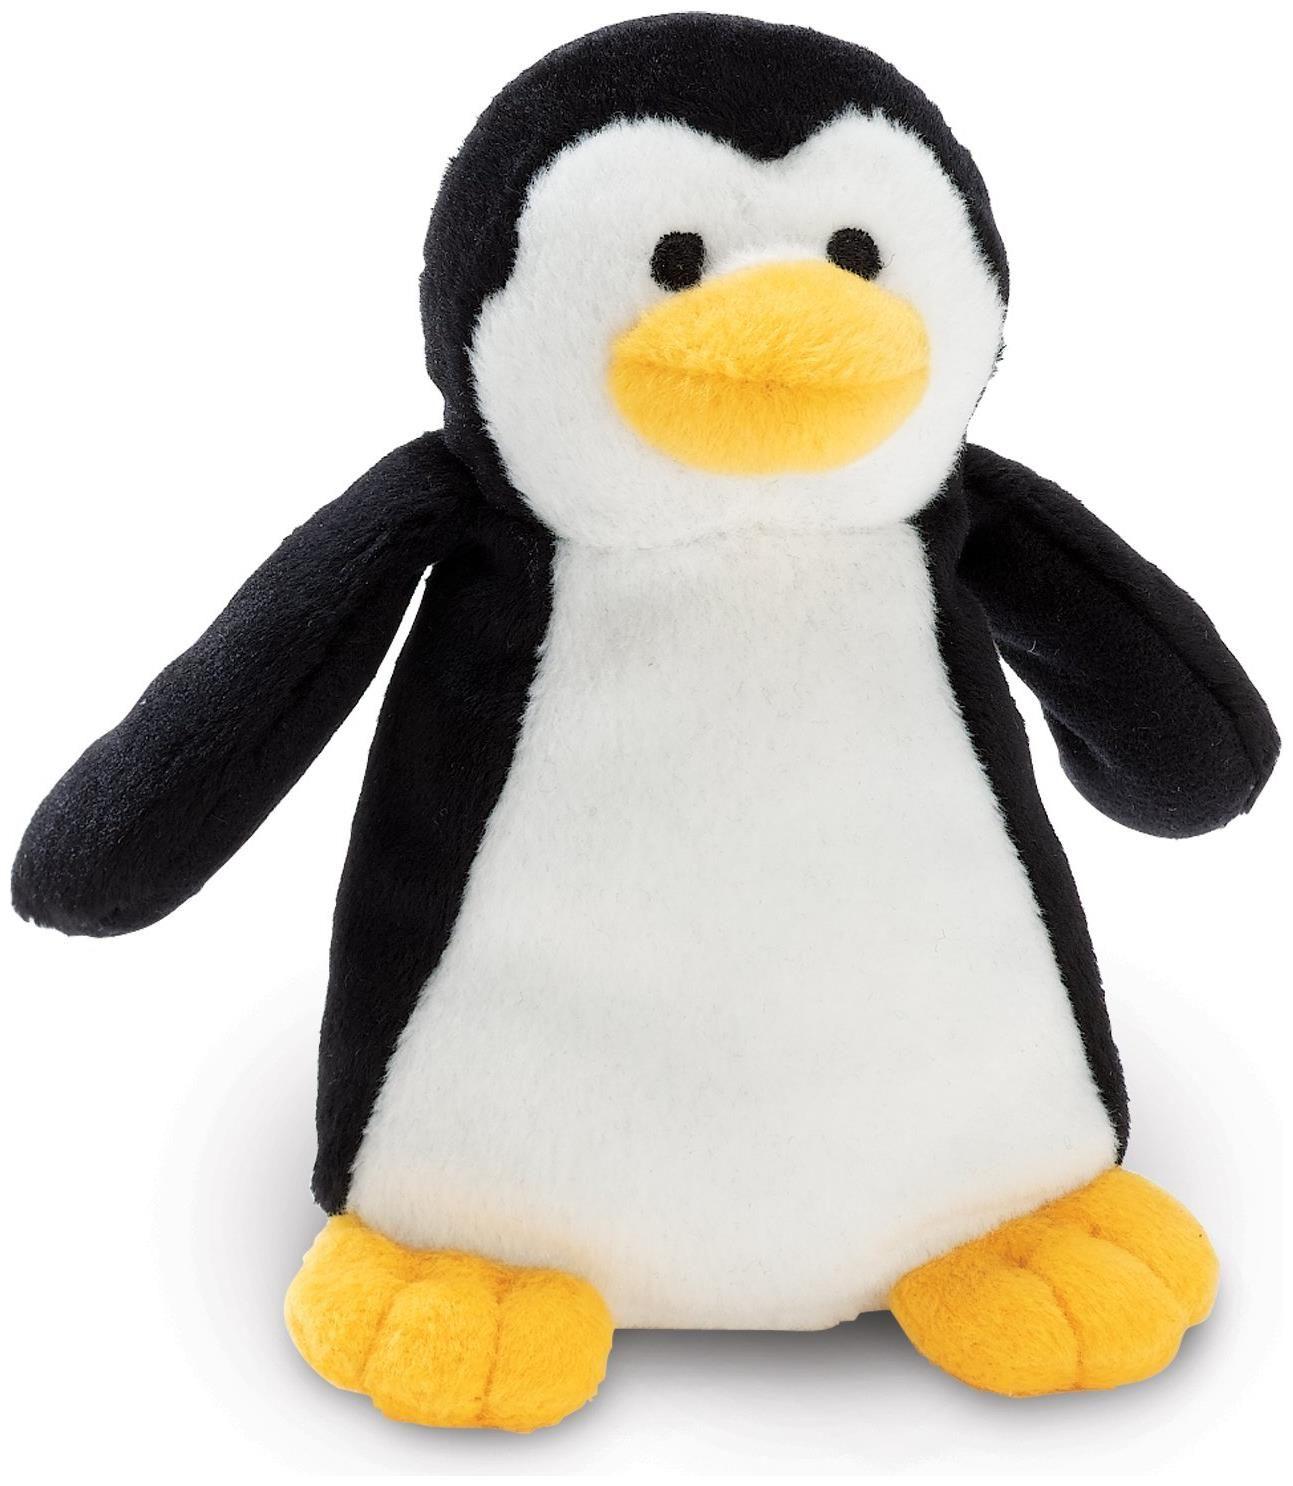 Plush Penguin Stuffed Animal   Pinterest   Penguins, Plush and ...